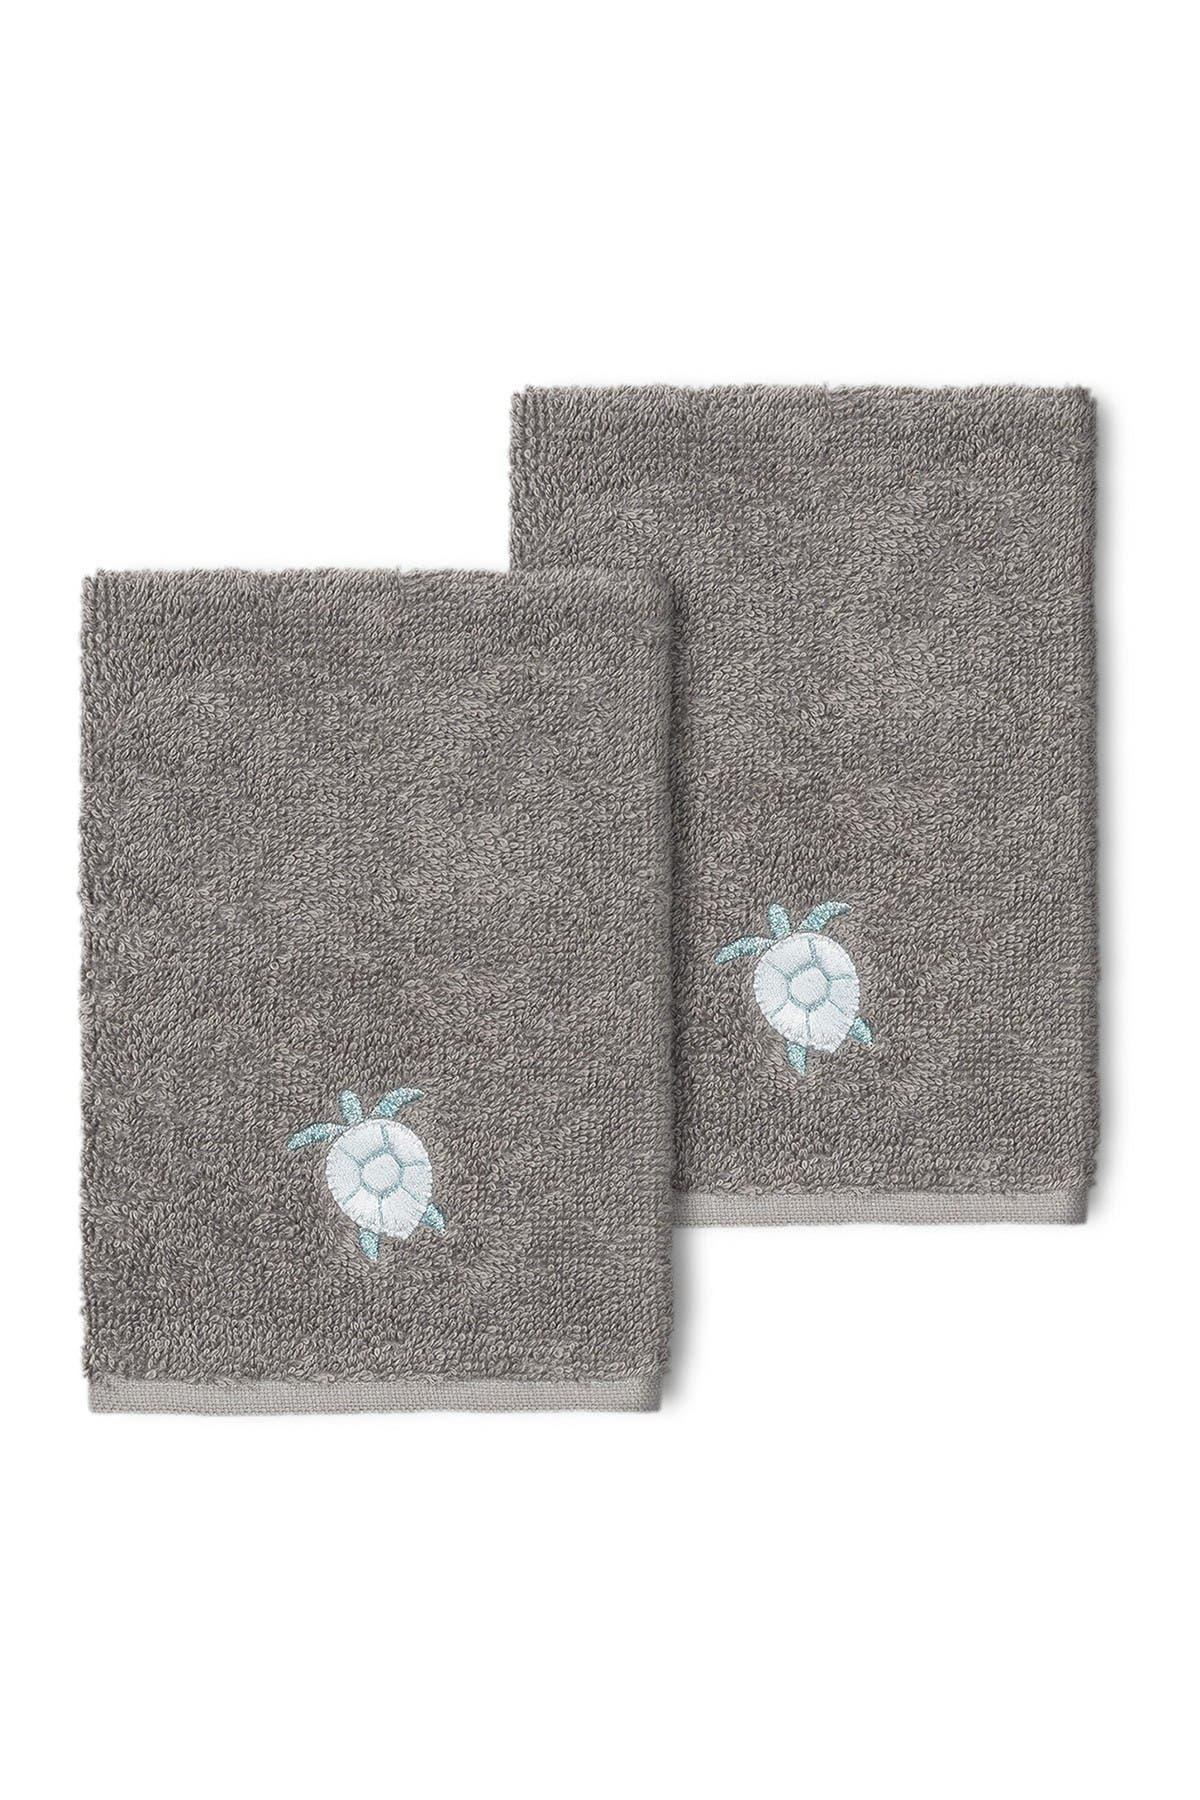 Image of LINUM HOME Ava Embellished Washcloth - Set of 2 - Dark Gray